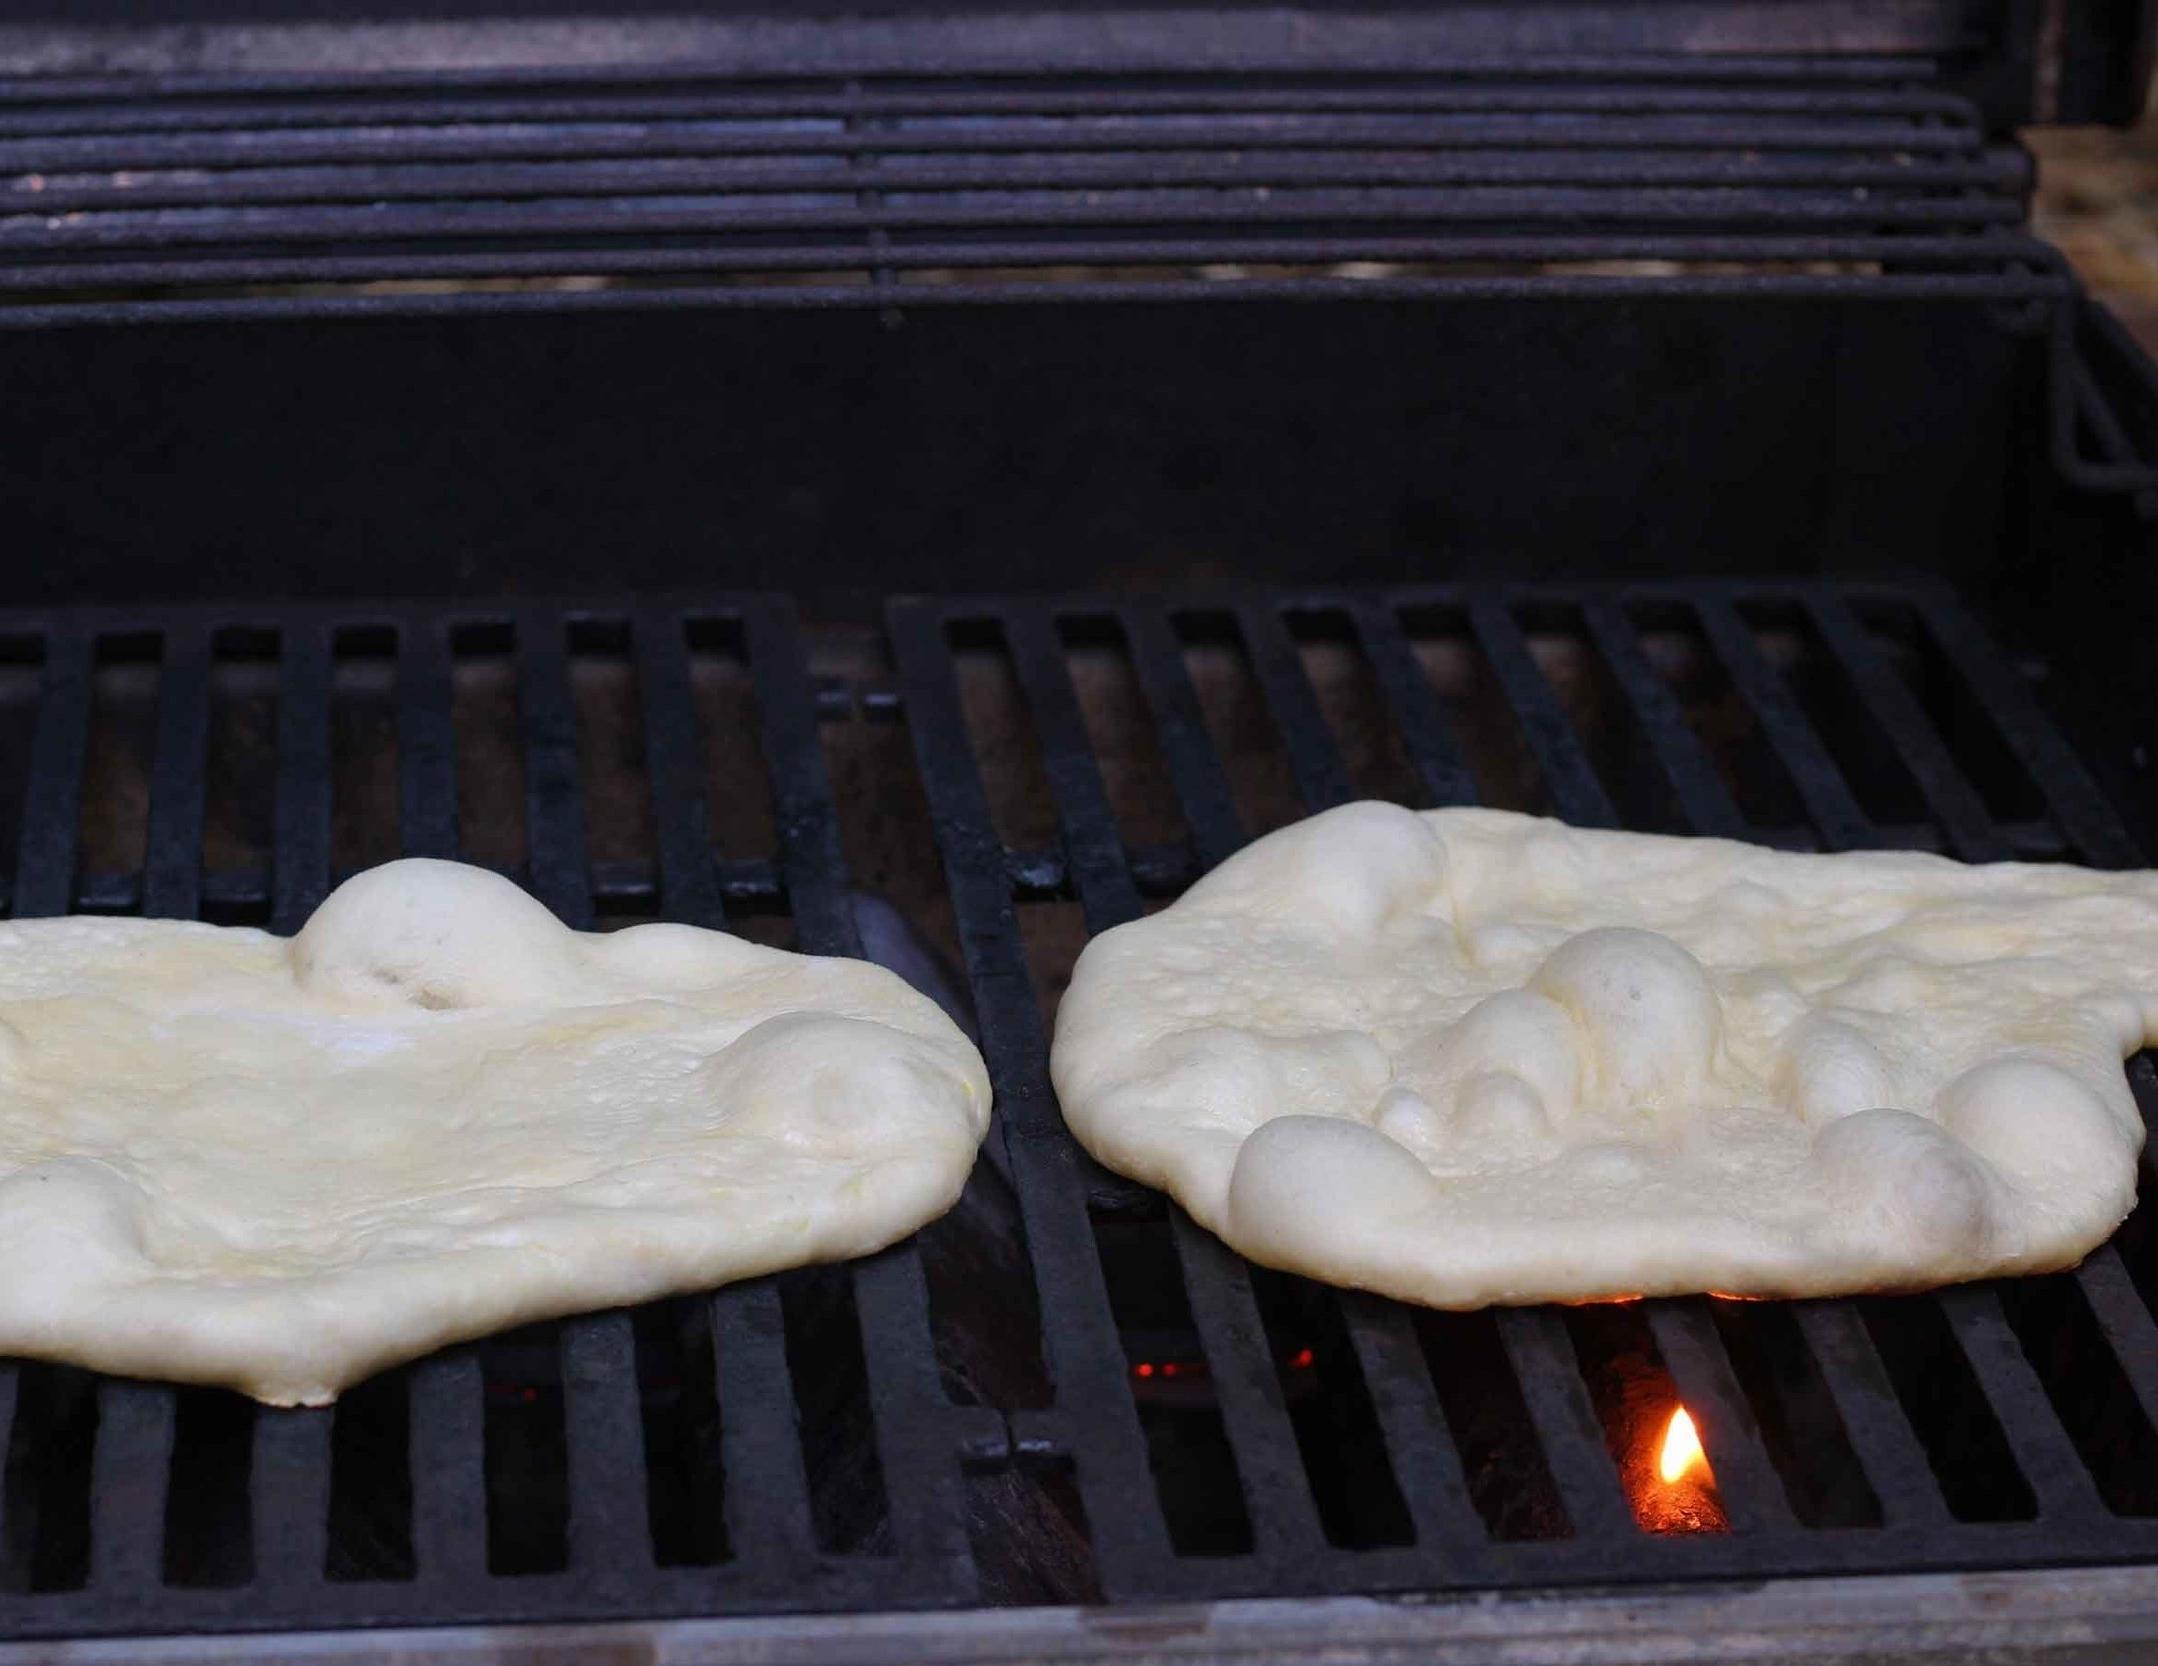 Grilling mini pizza crusts